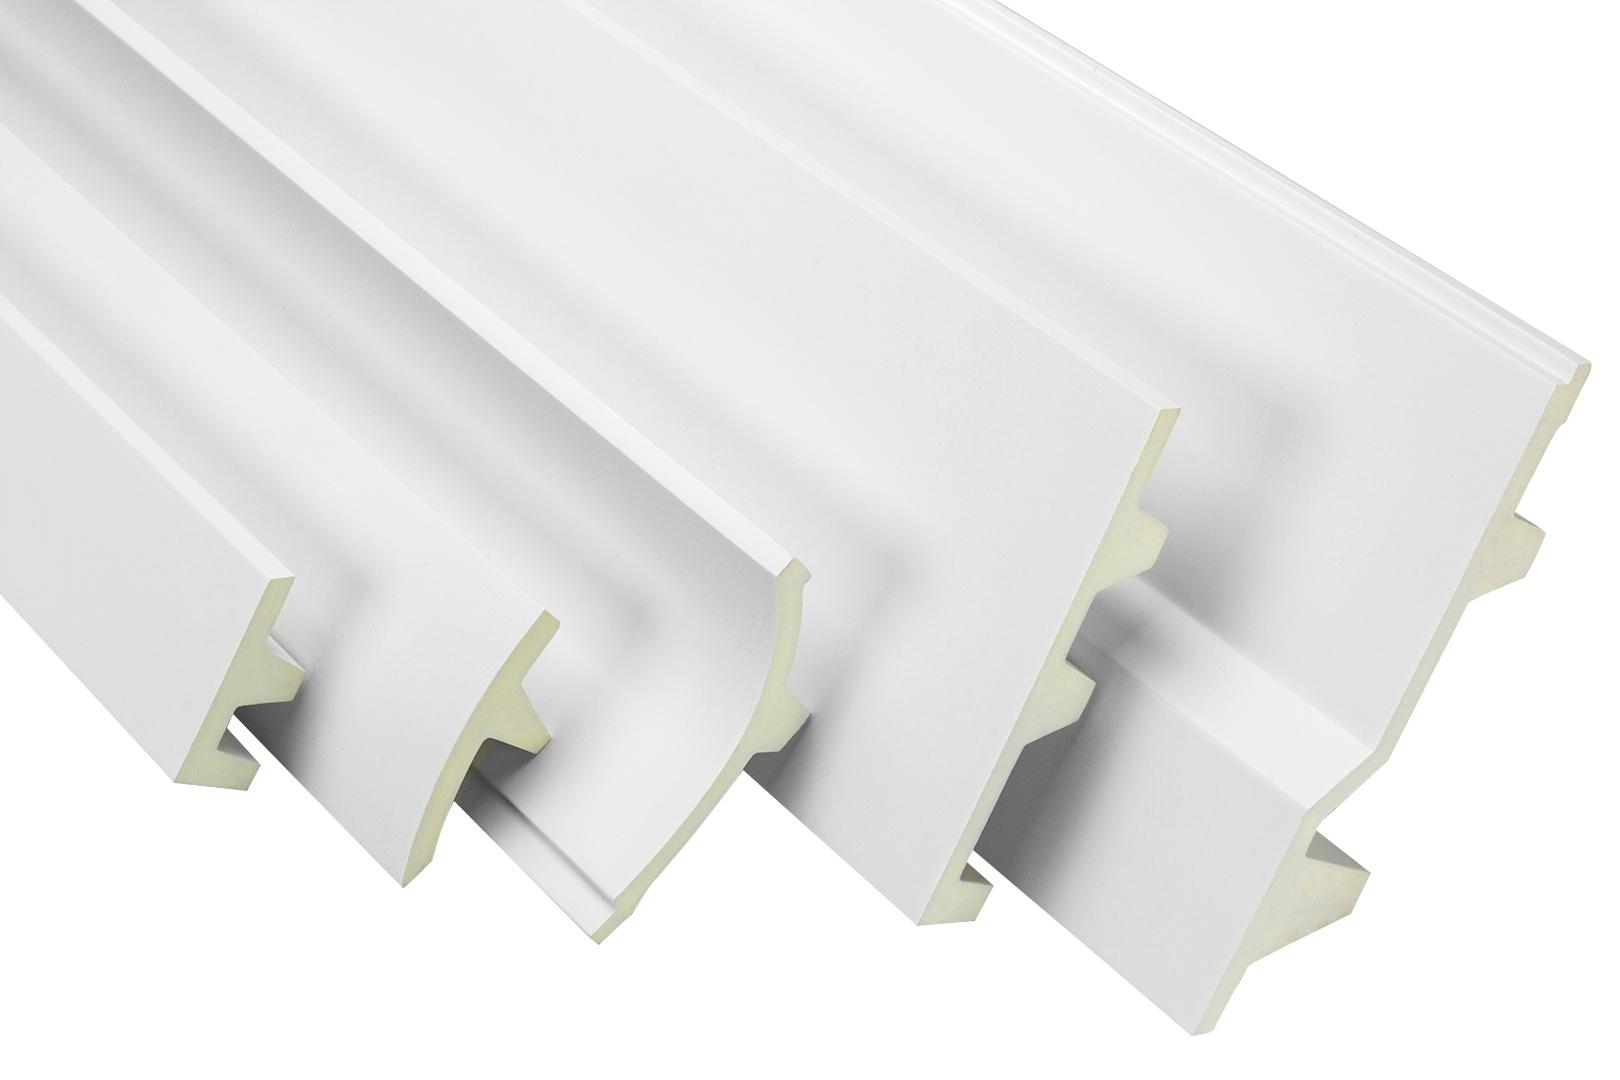 1 SET Muster Musterstücke Warenmuster Polyurethane LED Lichtleiste, KF Serie